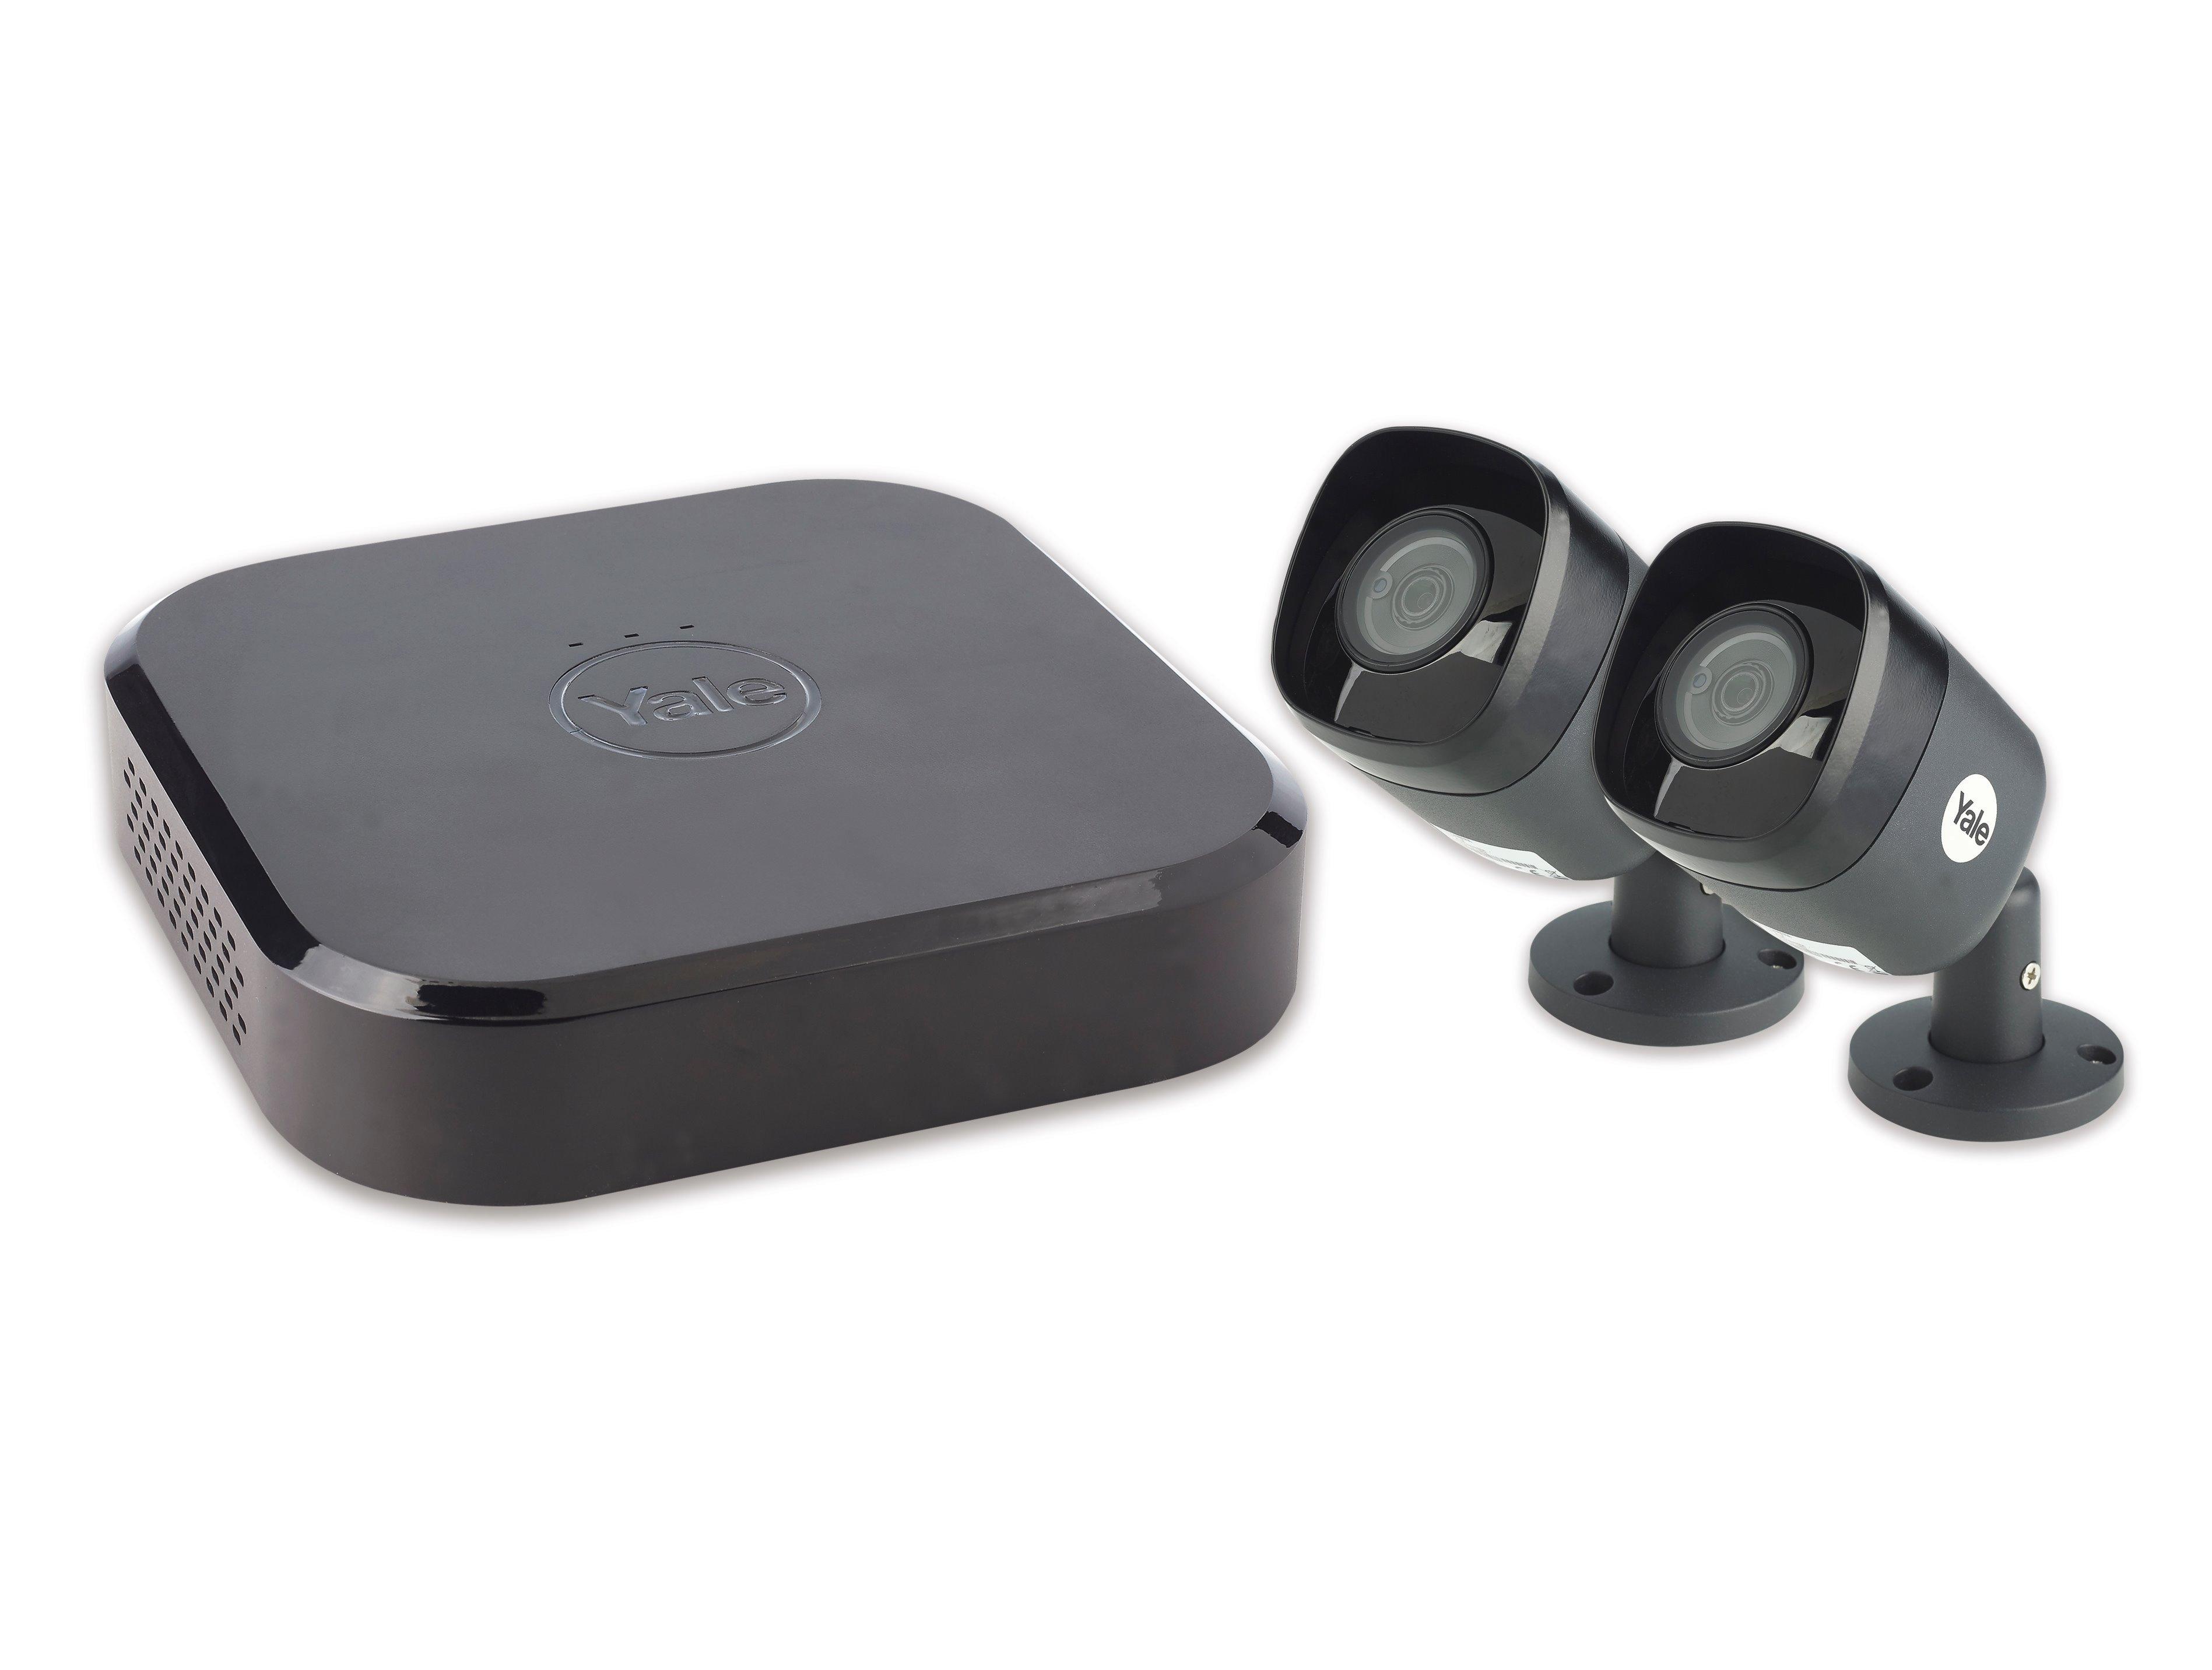 Kit CCTV Smart Home